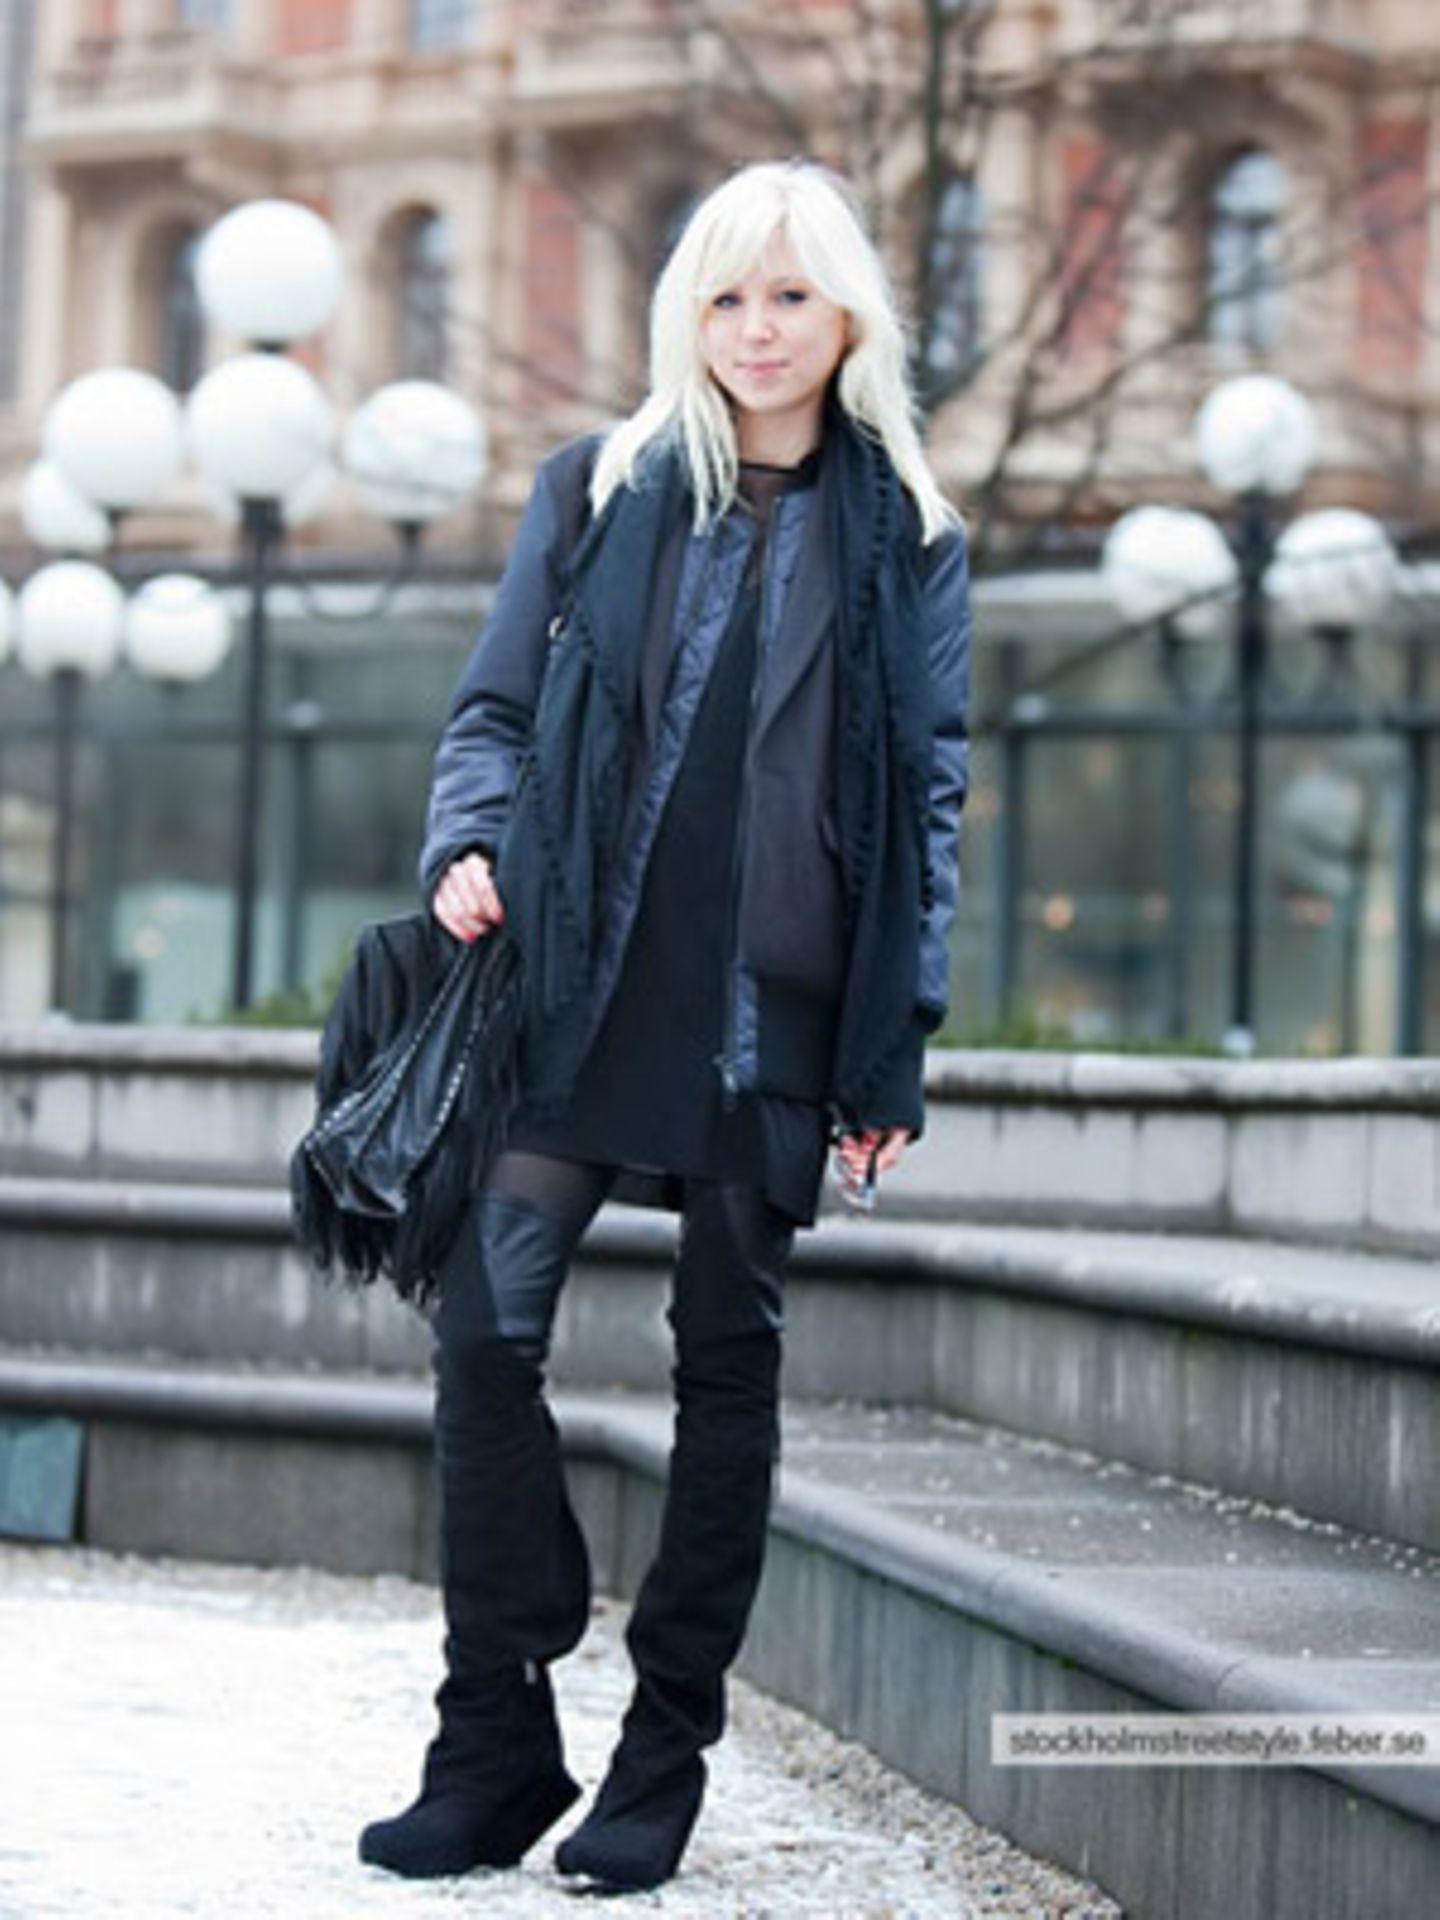 Fotostrecke: Stockholm Streetstyle - No. 1